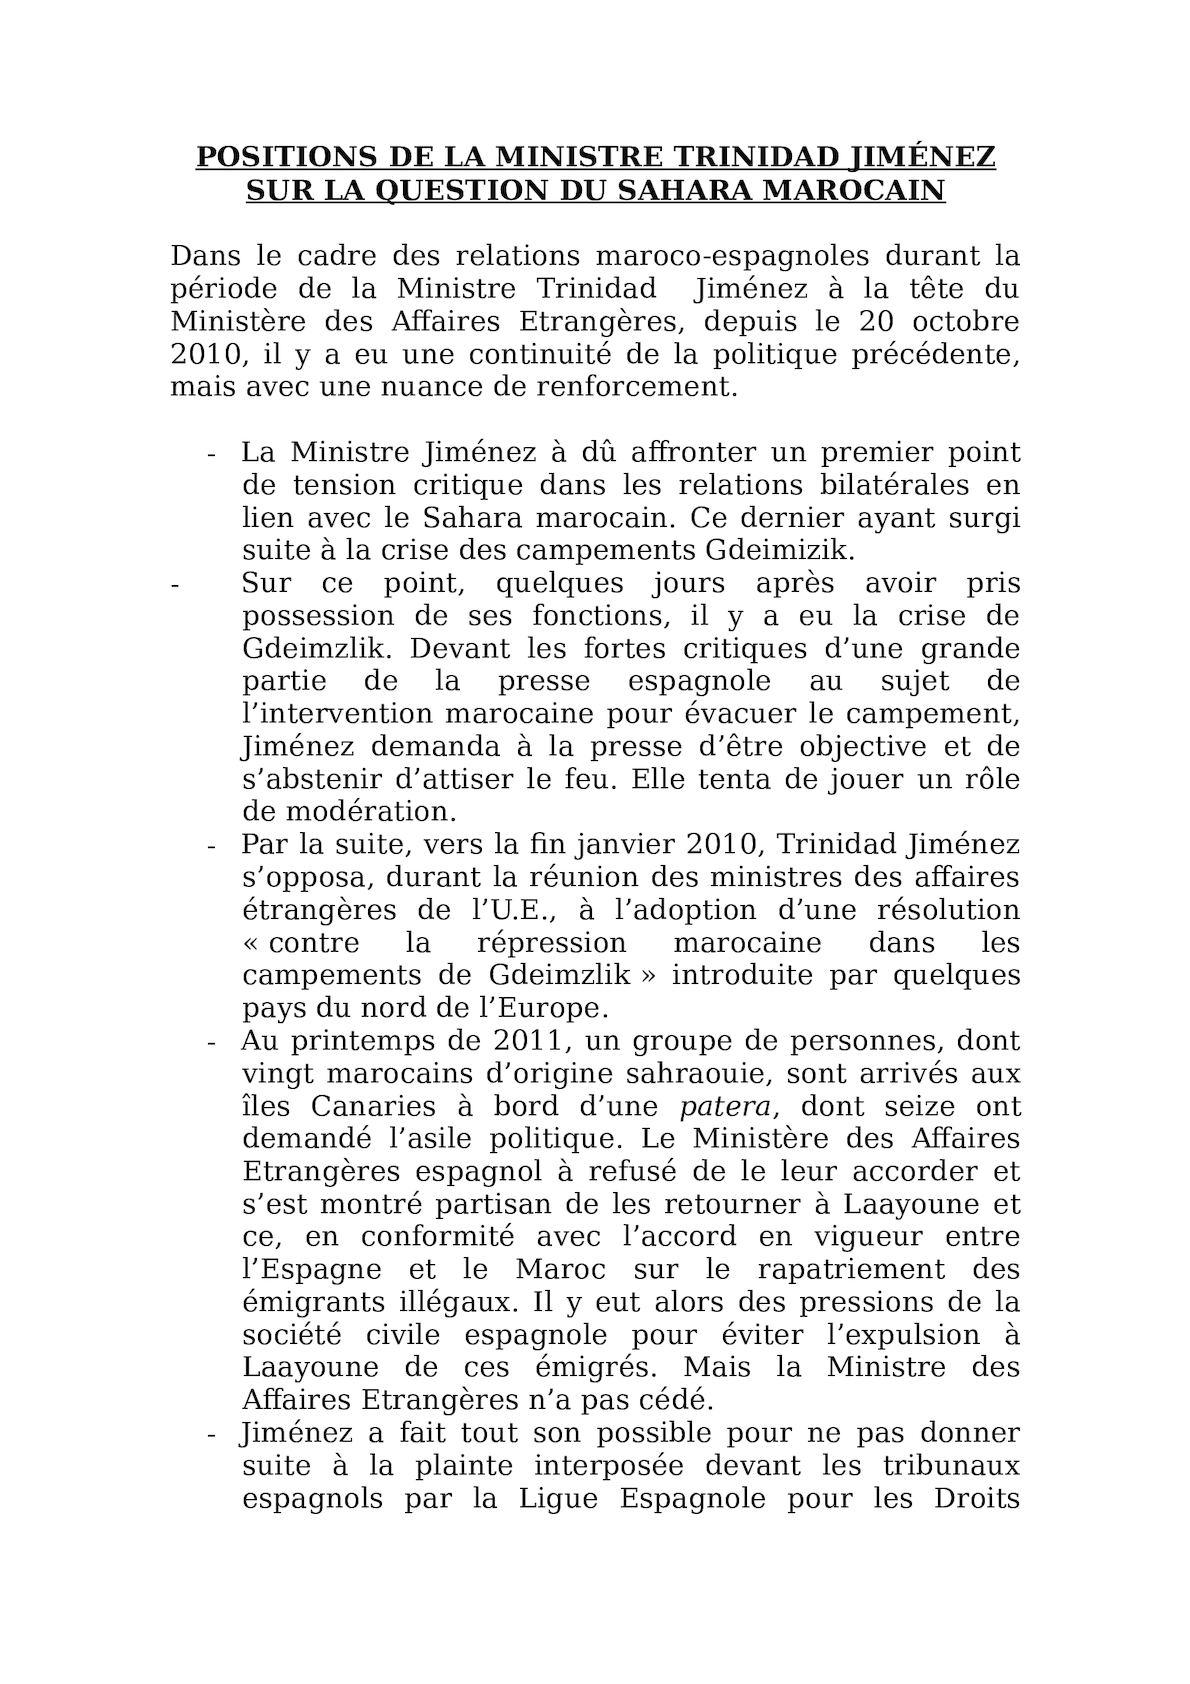 TRINIDAD JIMÉNEZ Et  QUESTION SAHARA